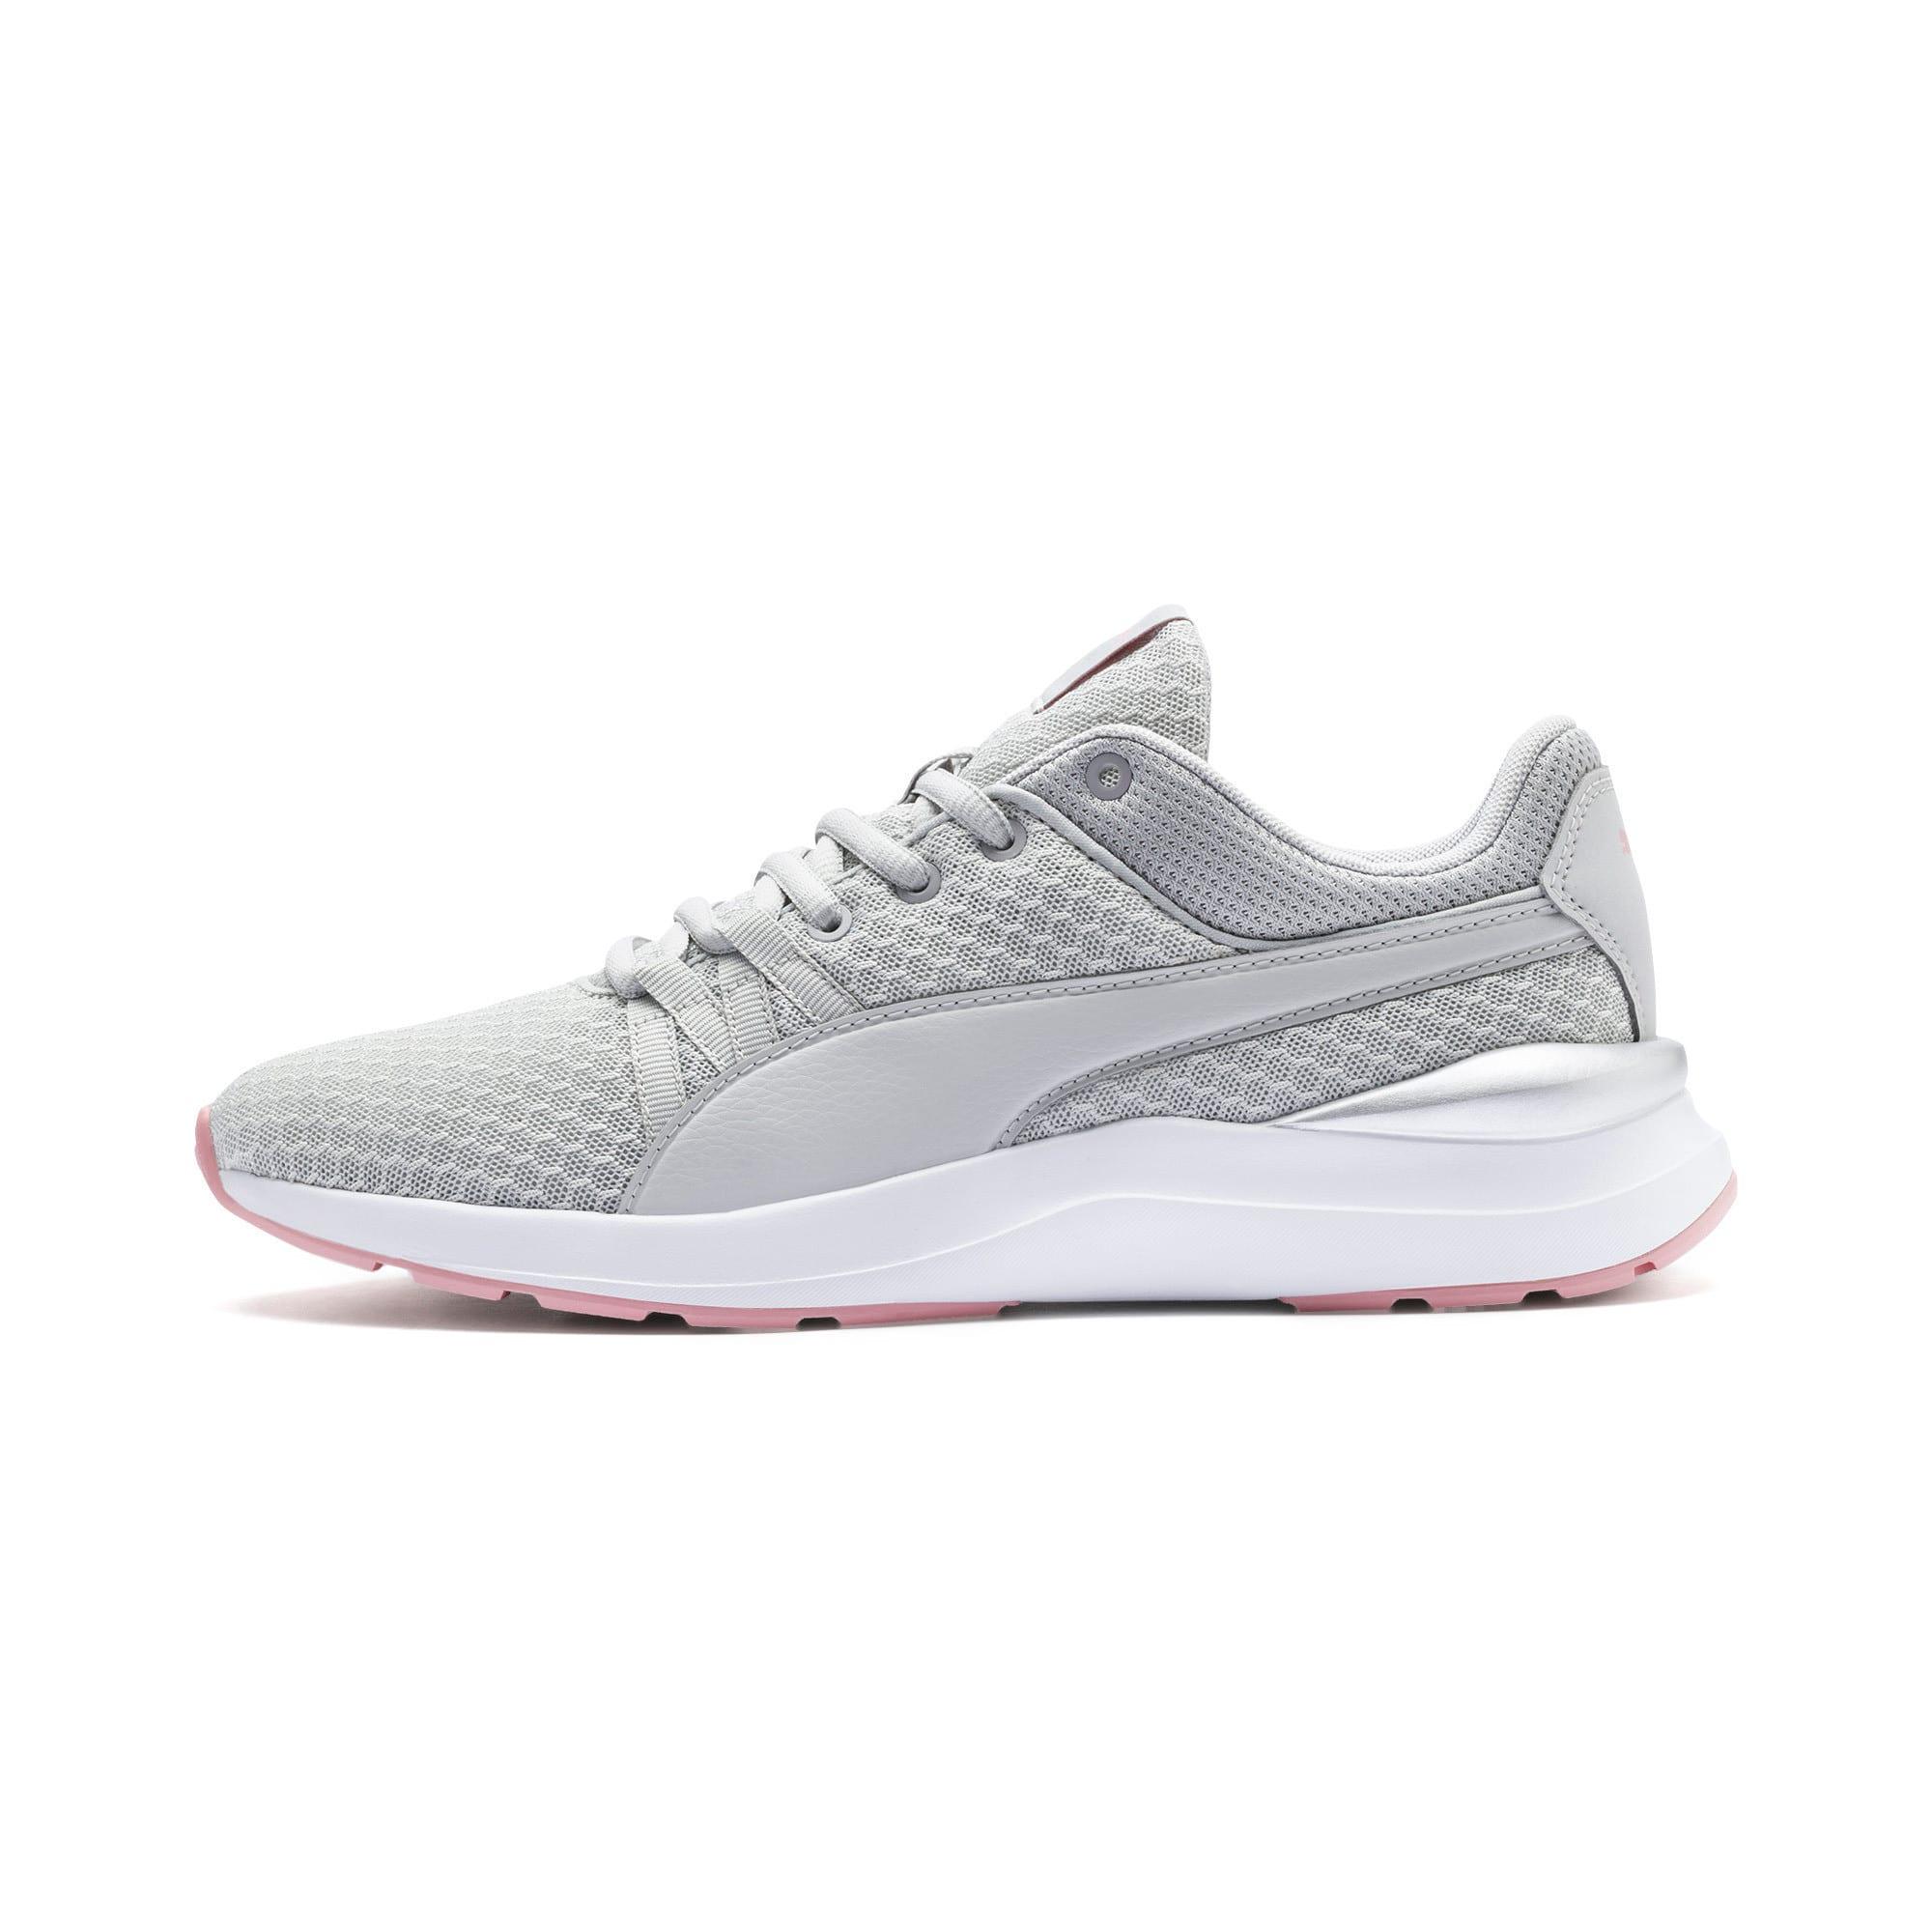 Thumbnail 1 of Adela Core Women's Sneakers, Gray Violet-Puma Silver, medium